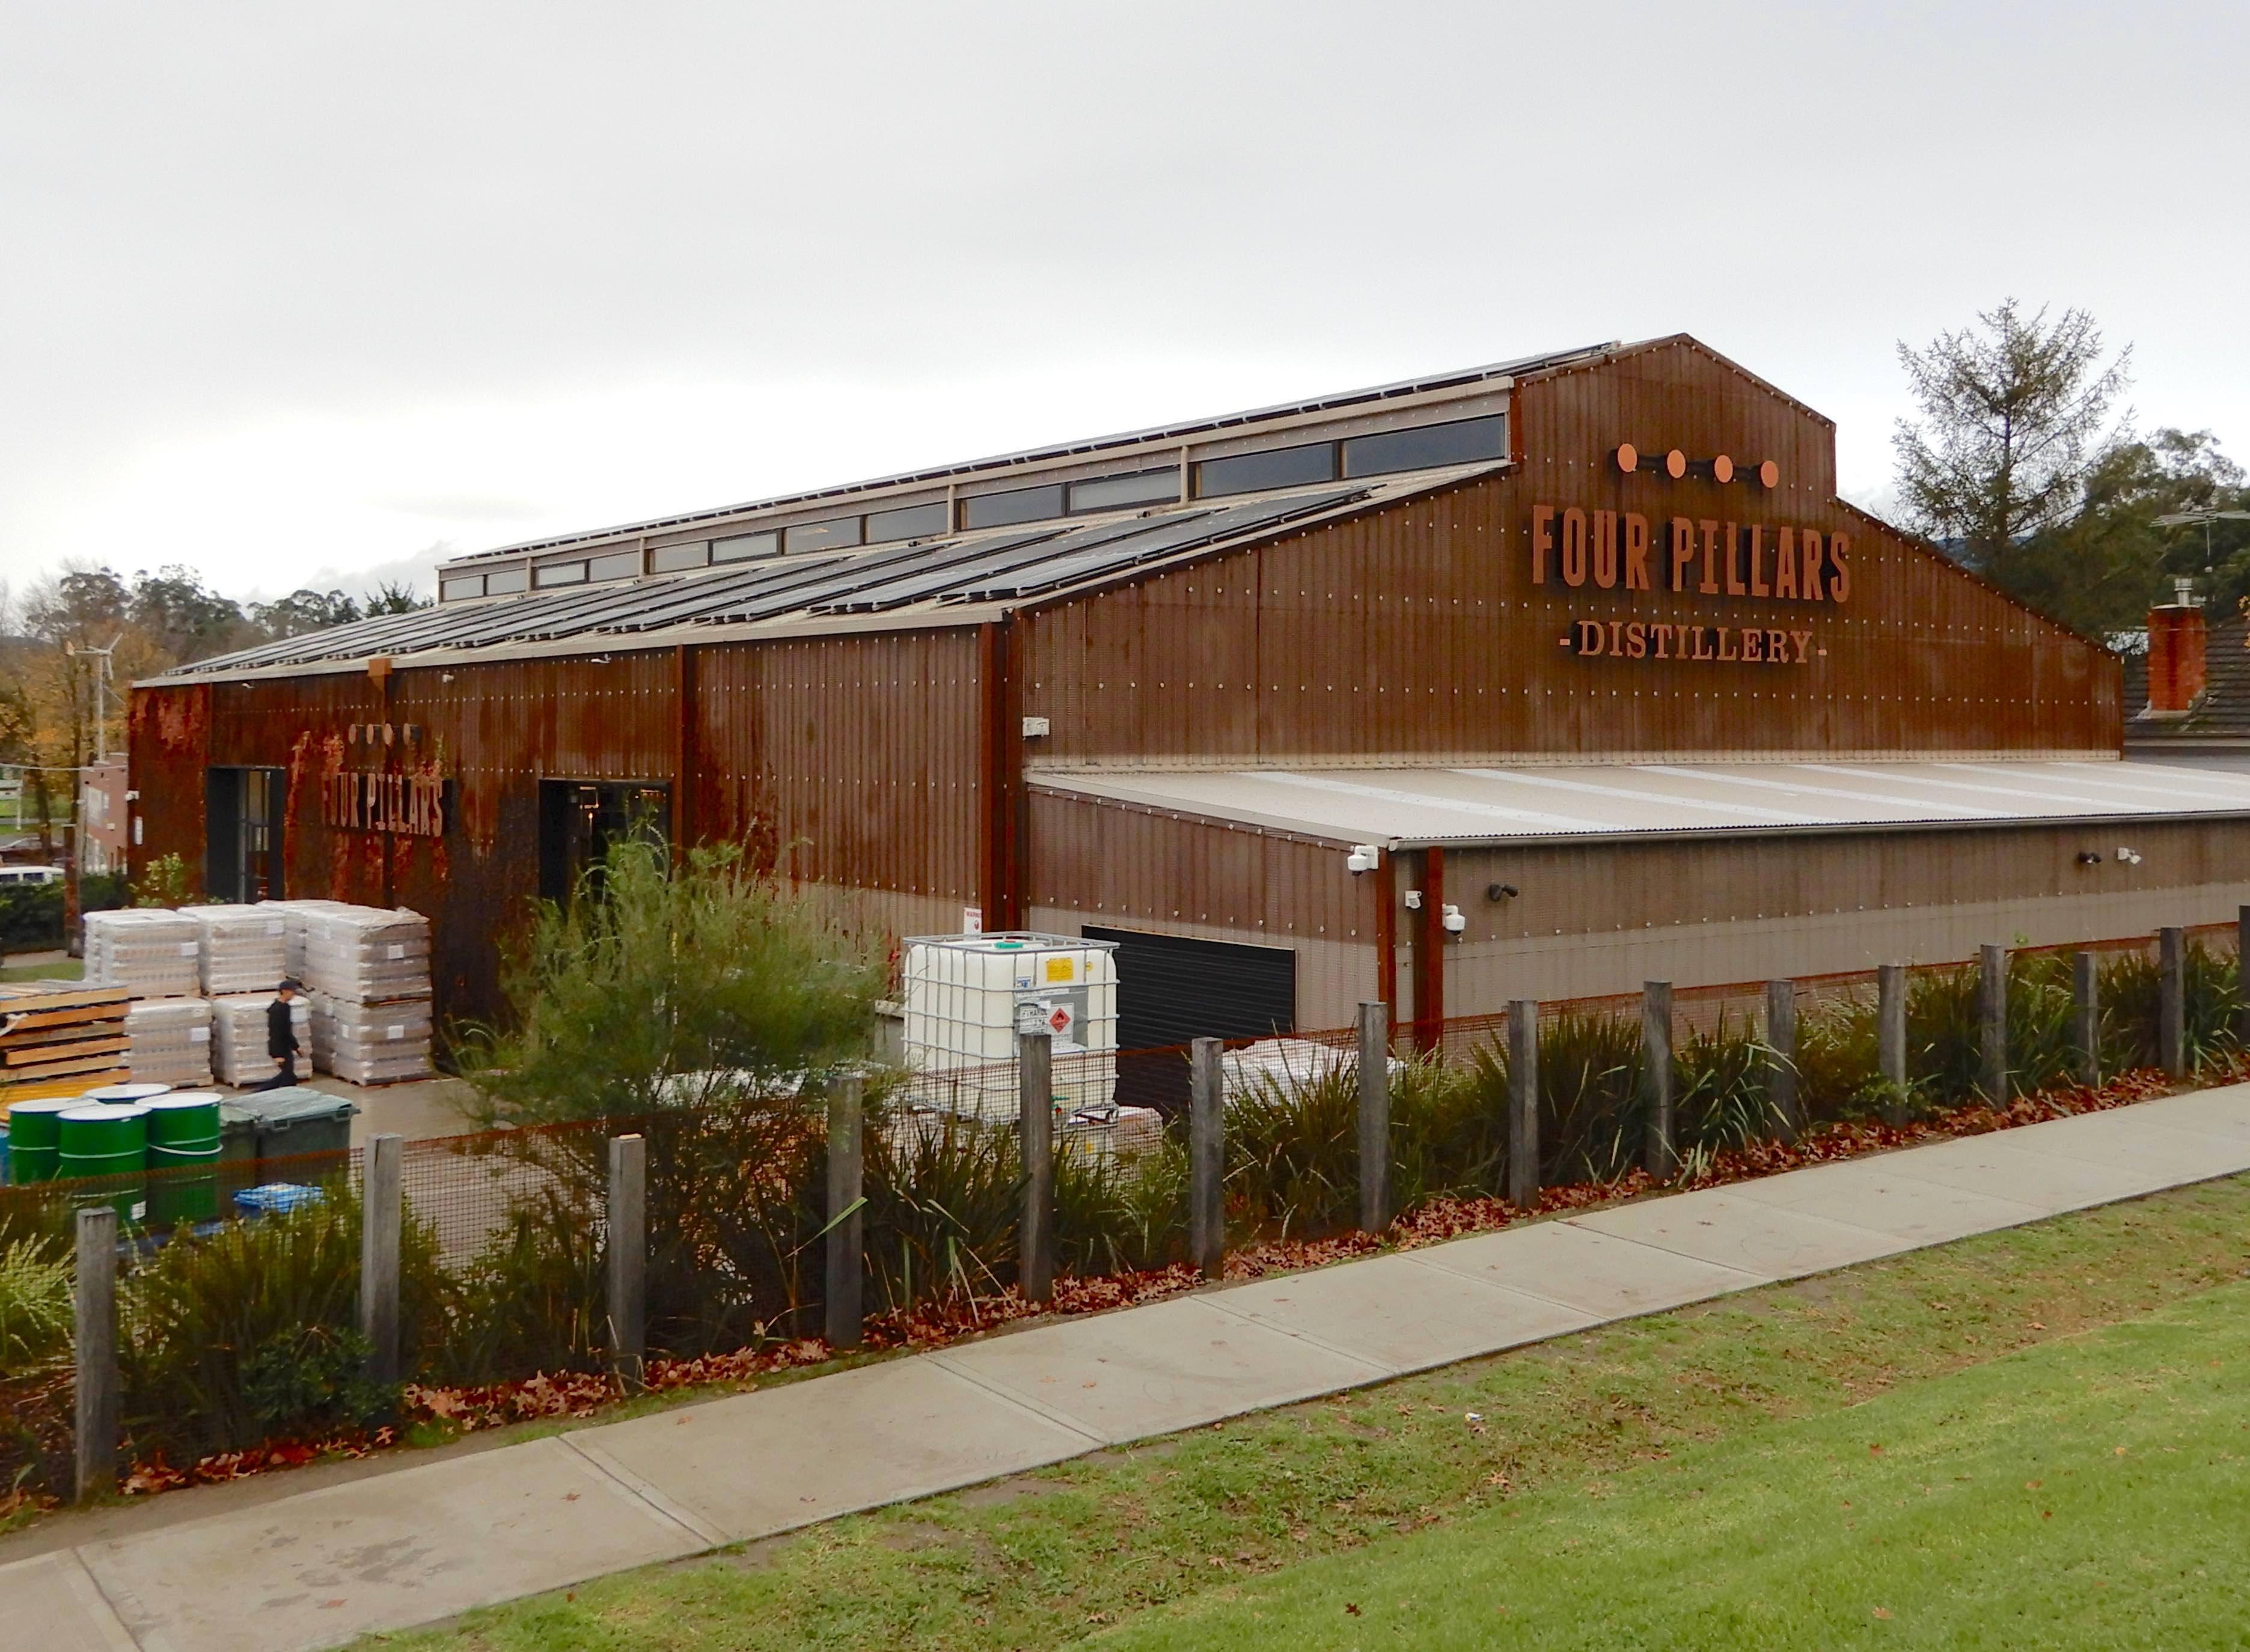 1.Four Pillars Distillery